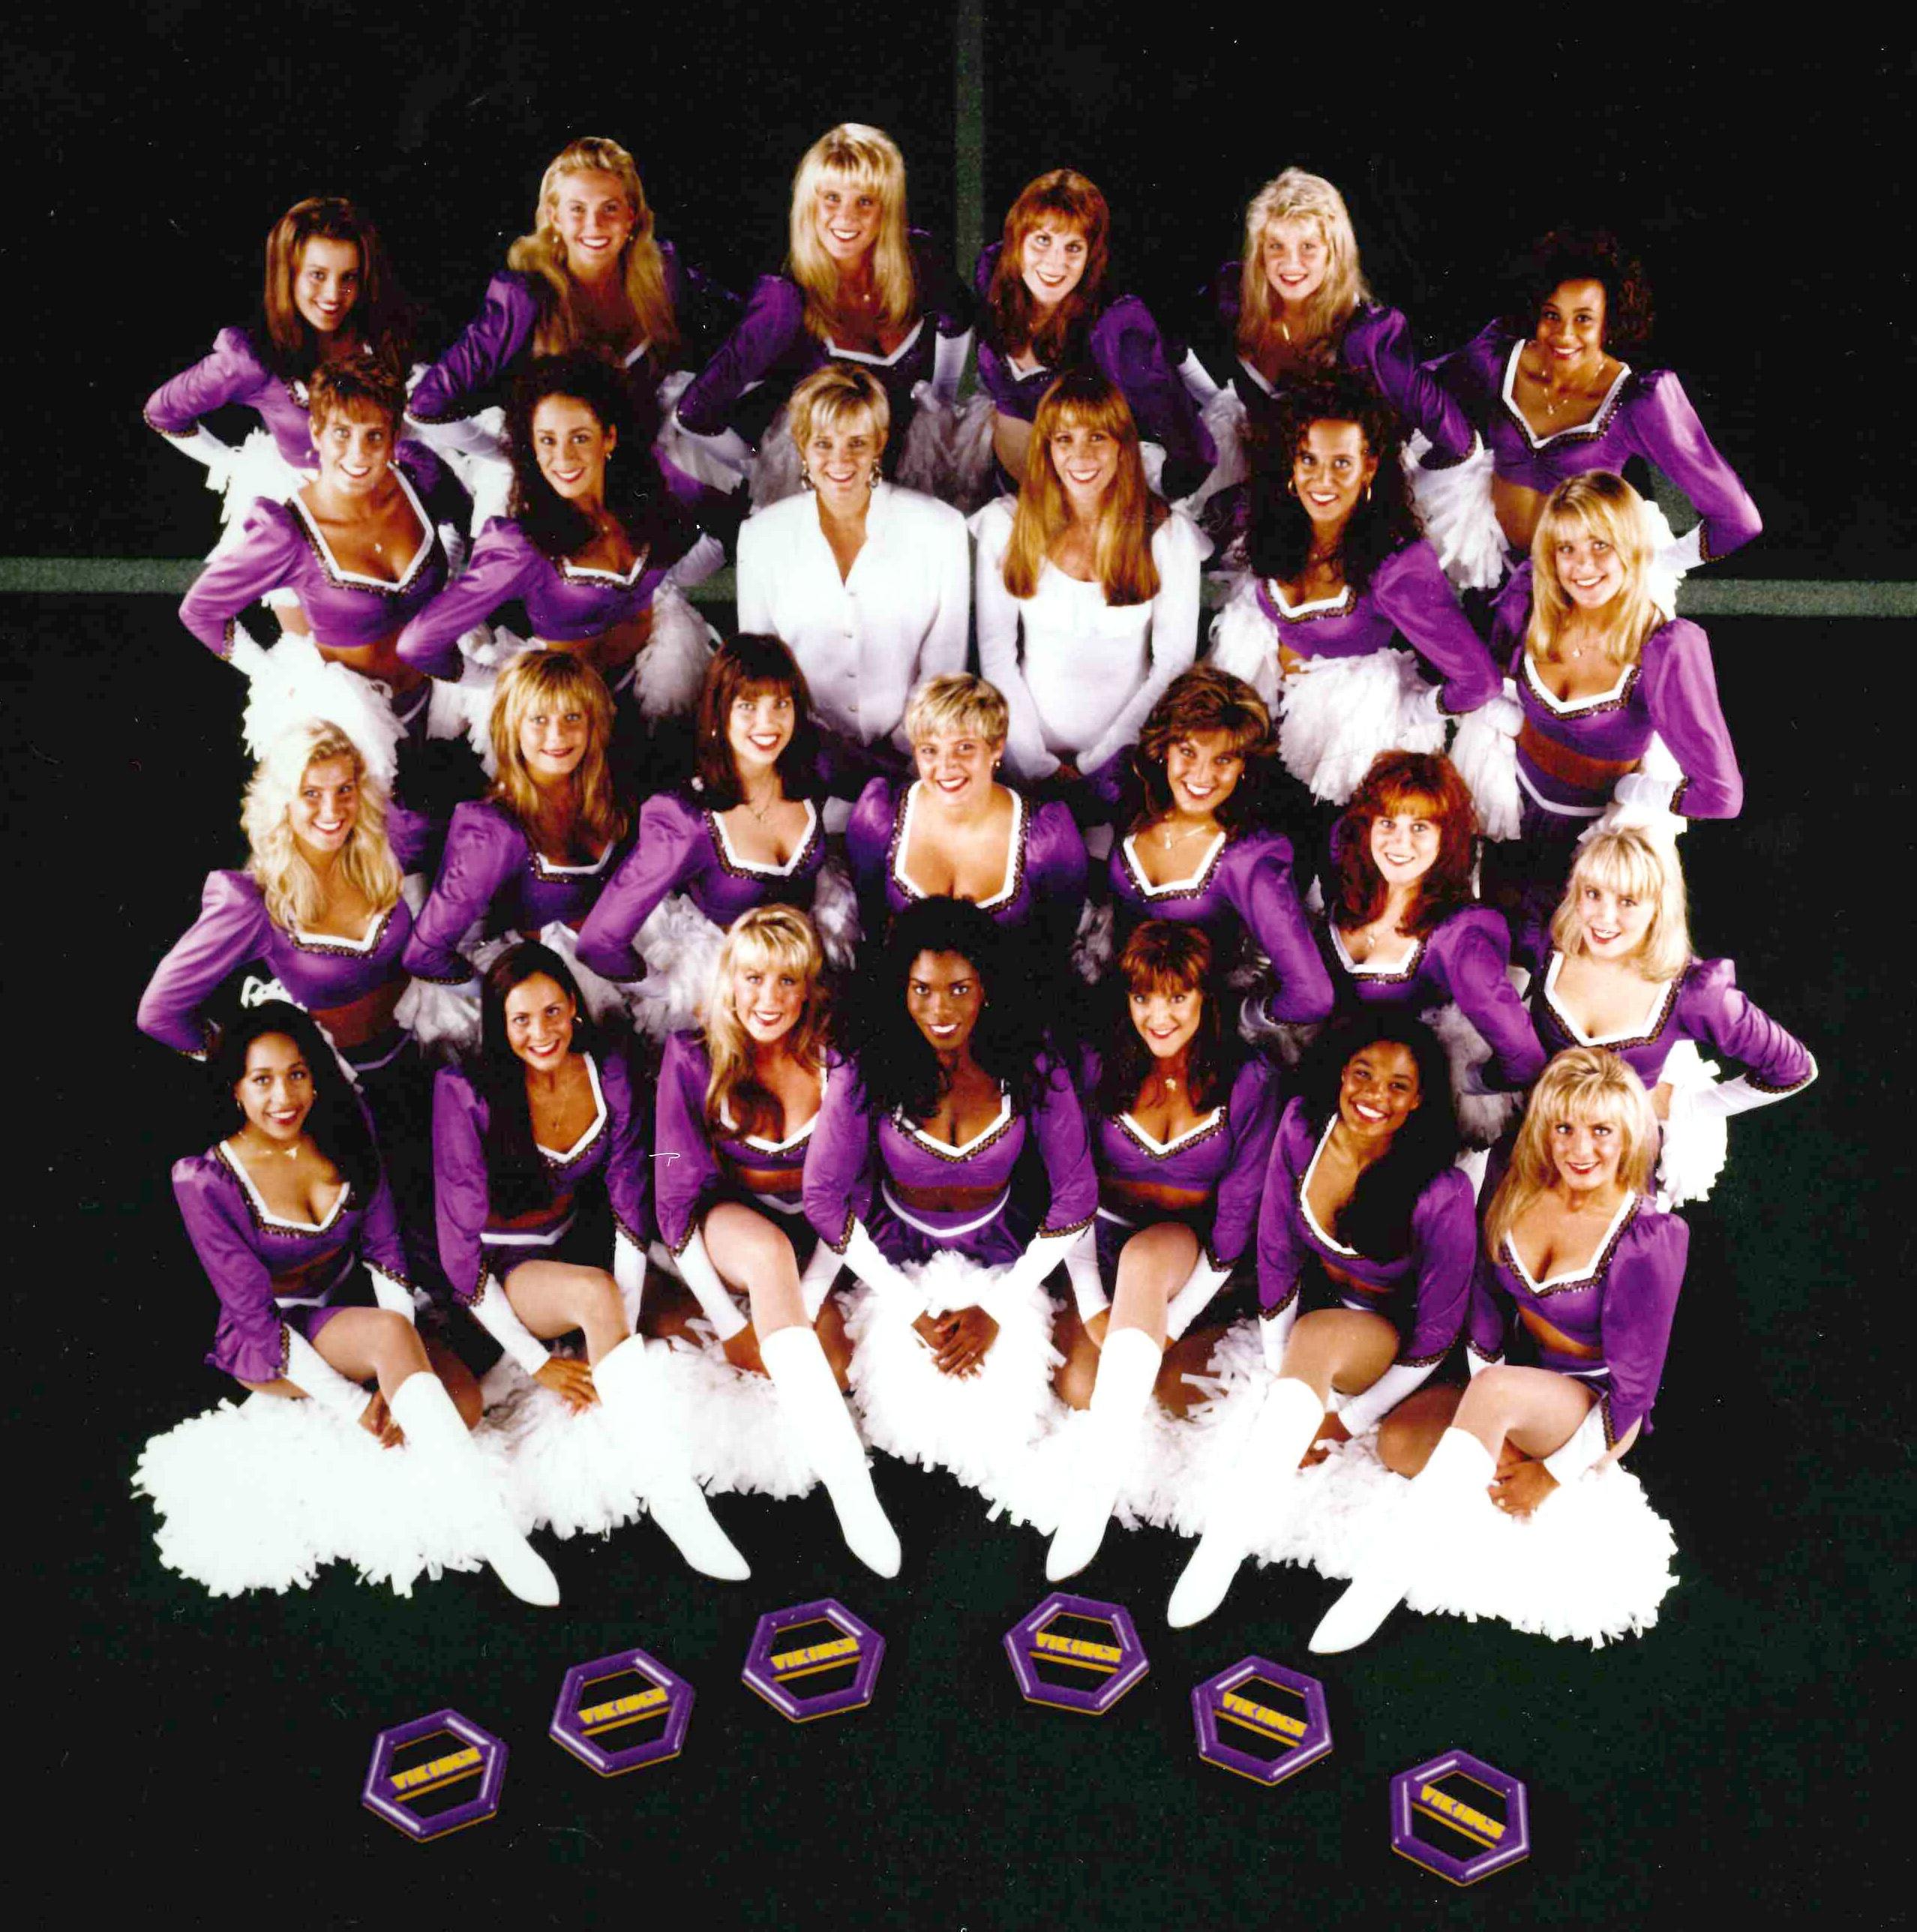 minnesota vikings cheerleaders throwback uniform